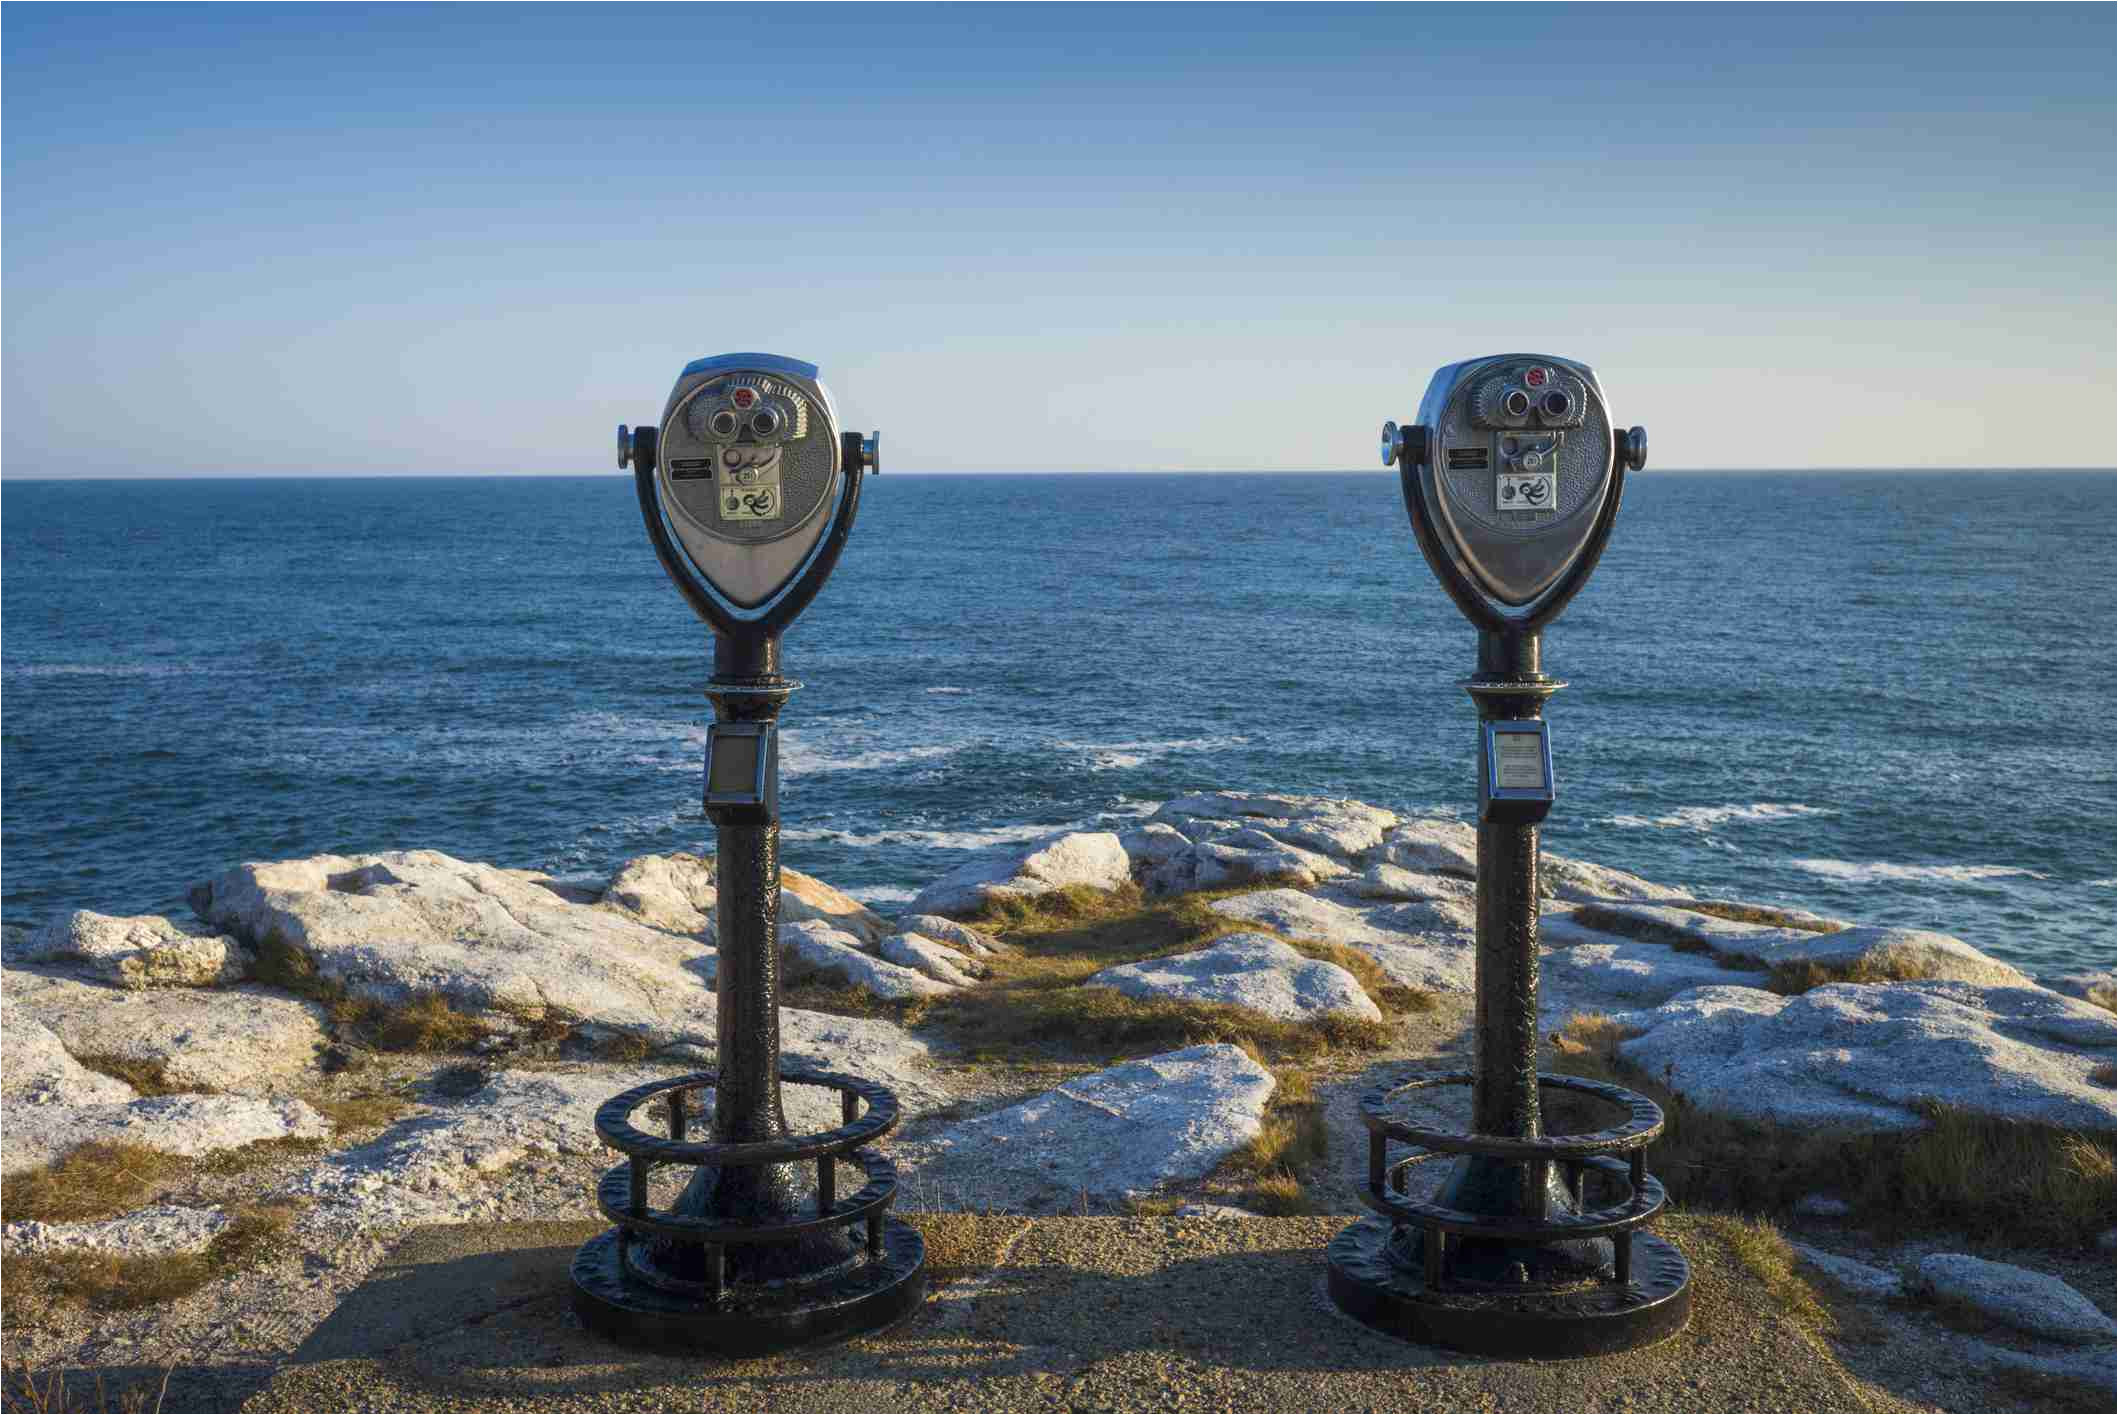 usa north america maine reid state park coin operated binoculars against sea